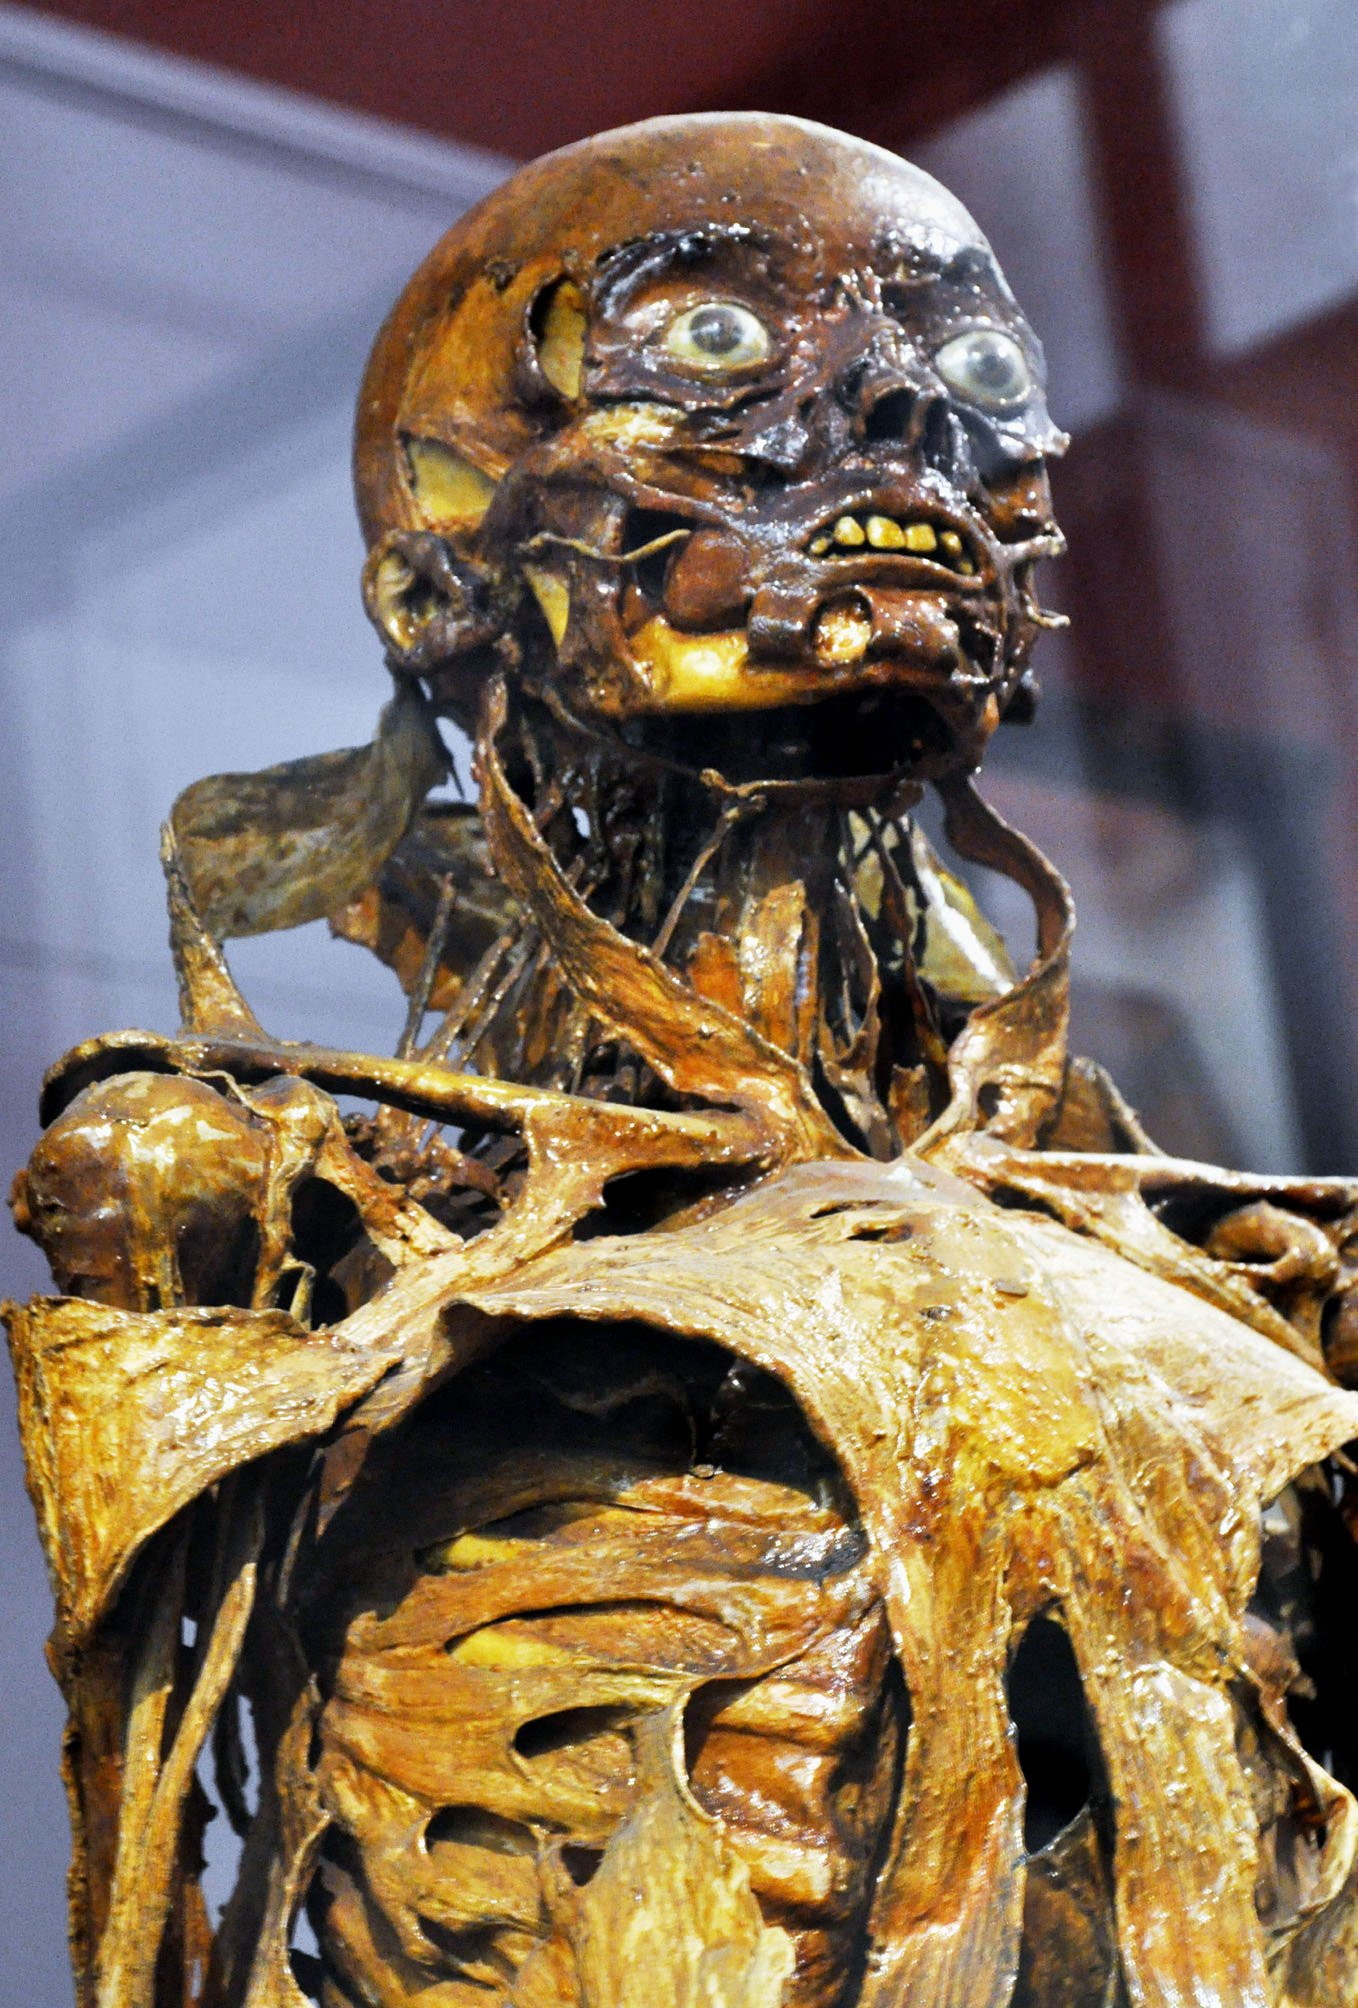 F fontana cire anatomique mus e d 39 anatomie de montpellier board of - Musee fragonard paris ...